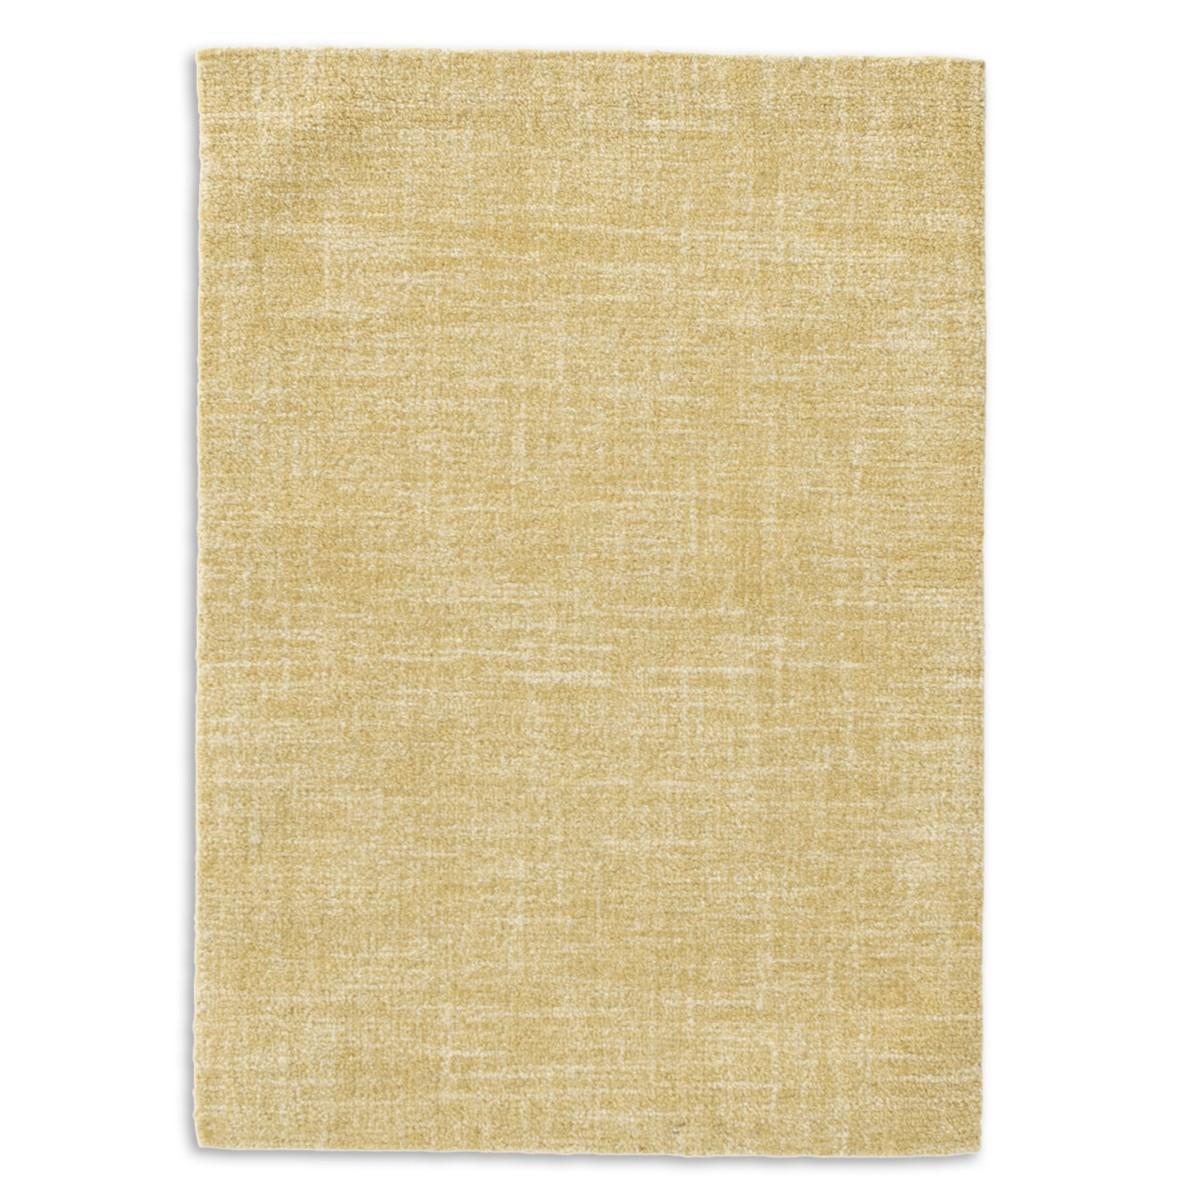 Crosshatch Wool Micro Hooked Rug - Gold